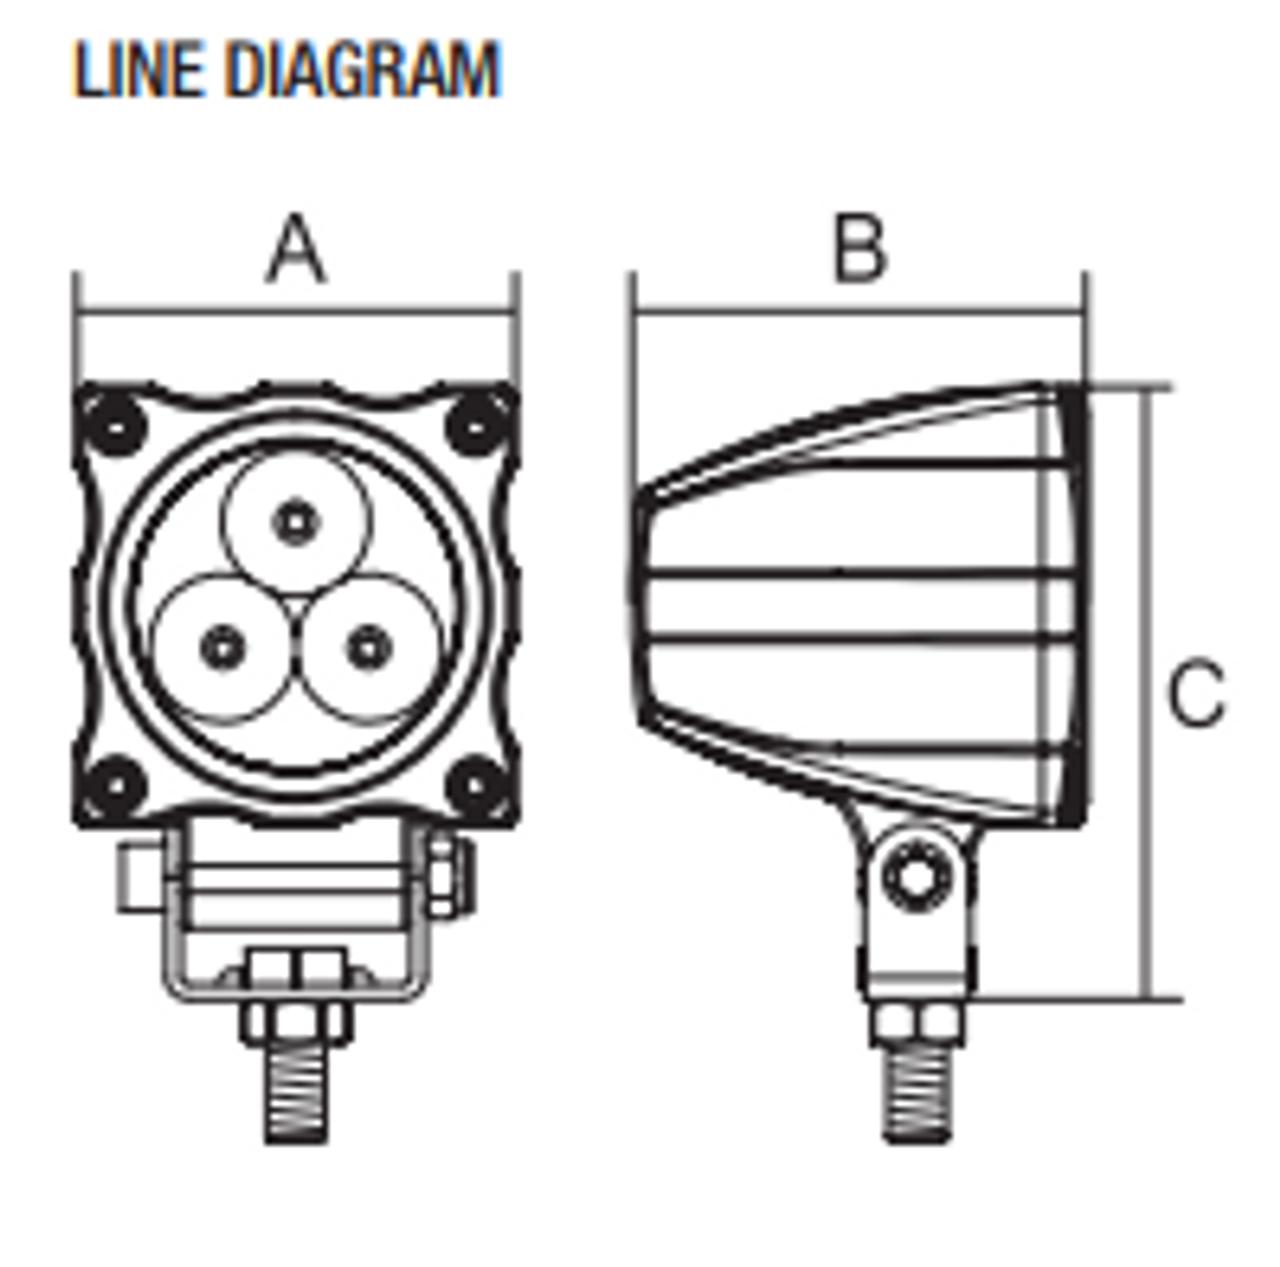 Line Drawing- RWL215F - 2.5 Inch Square LED Flood Work Light. Multi-Volt 10v & 30v. 15 Watt. RoadVision. Ultimate LED.